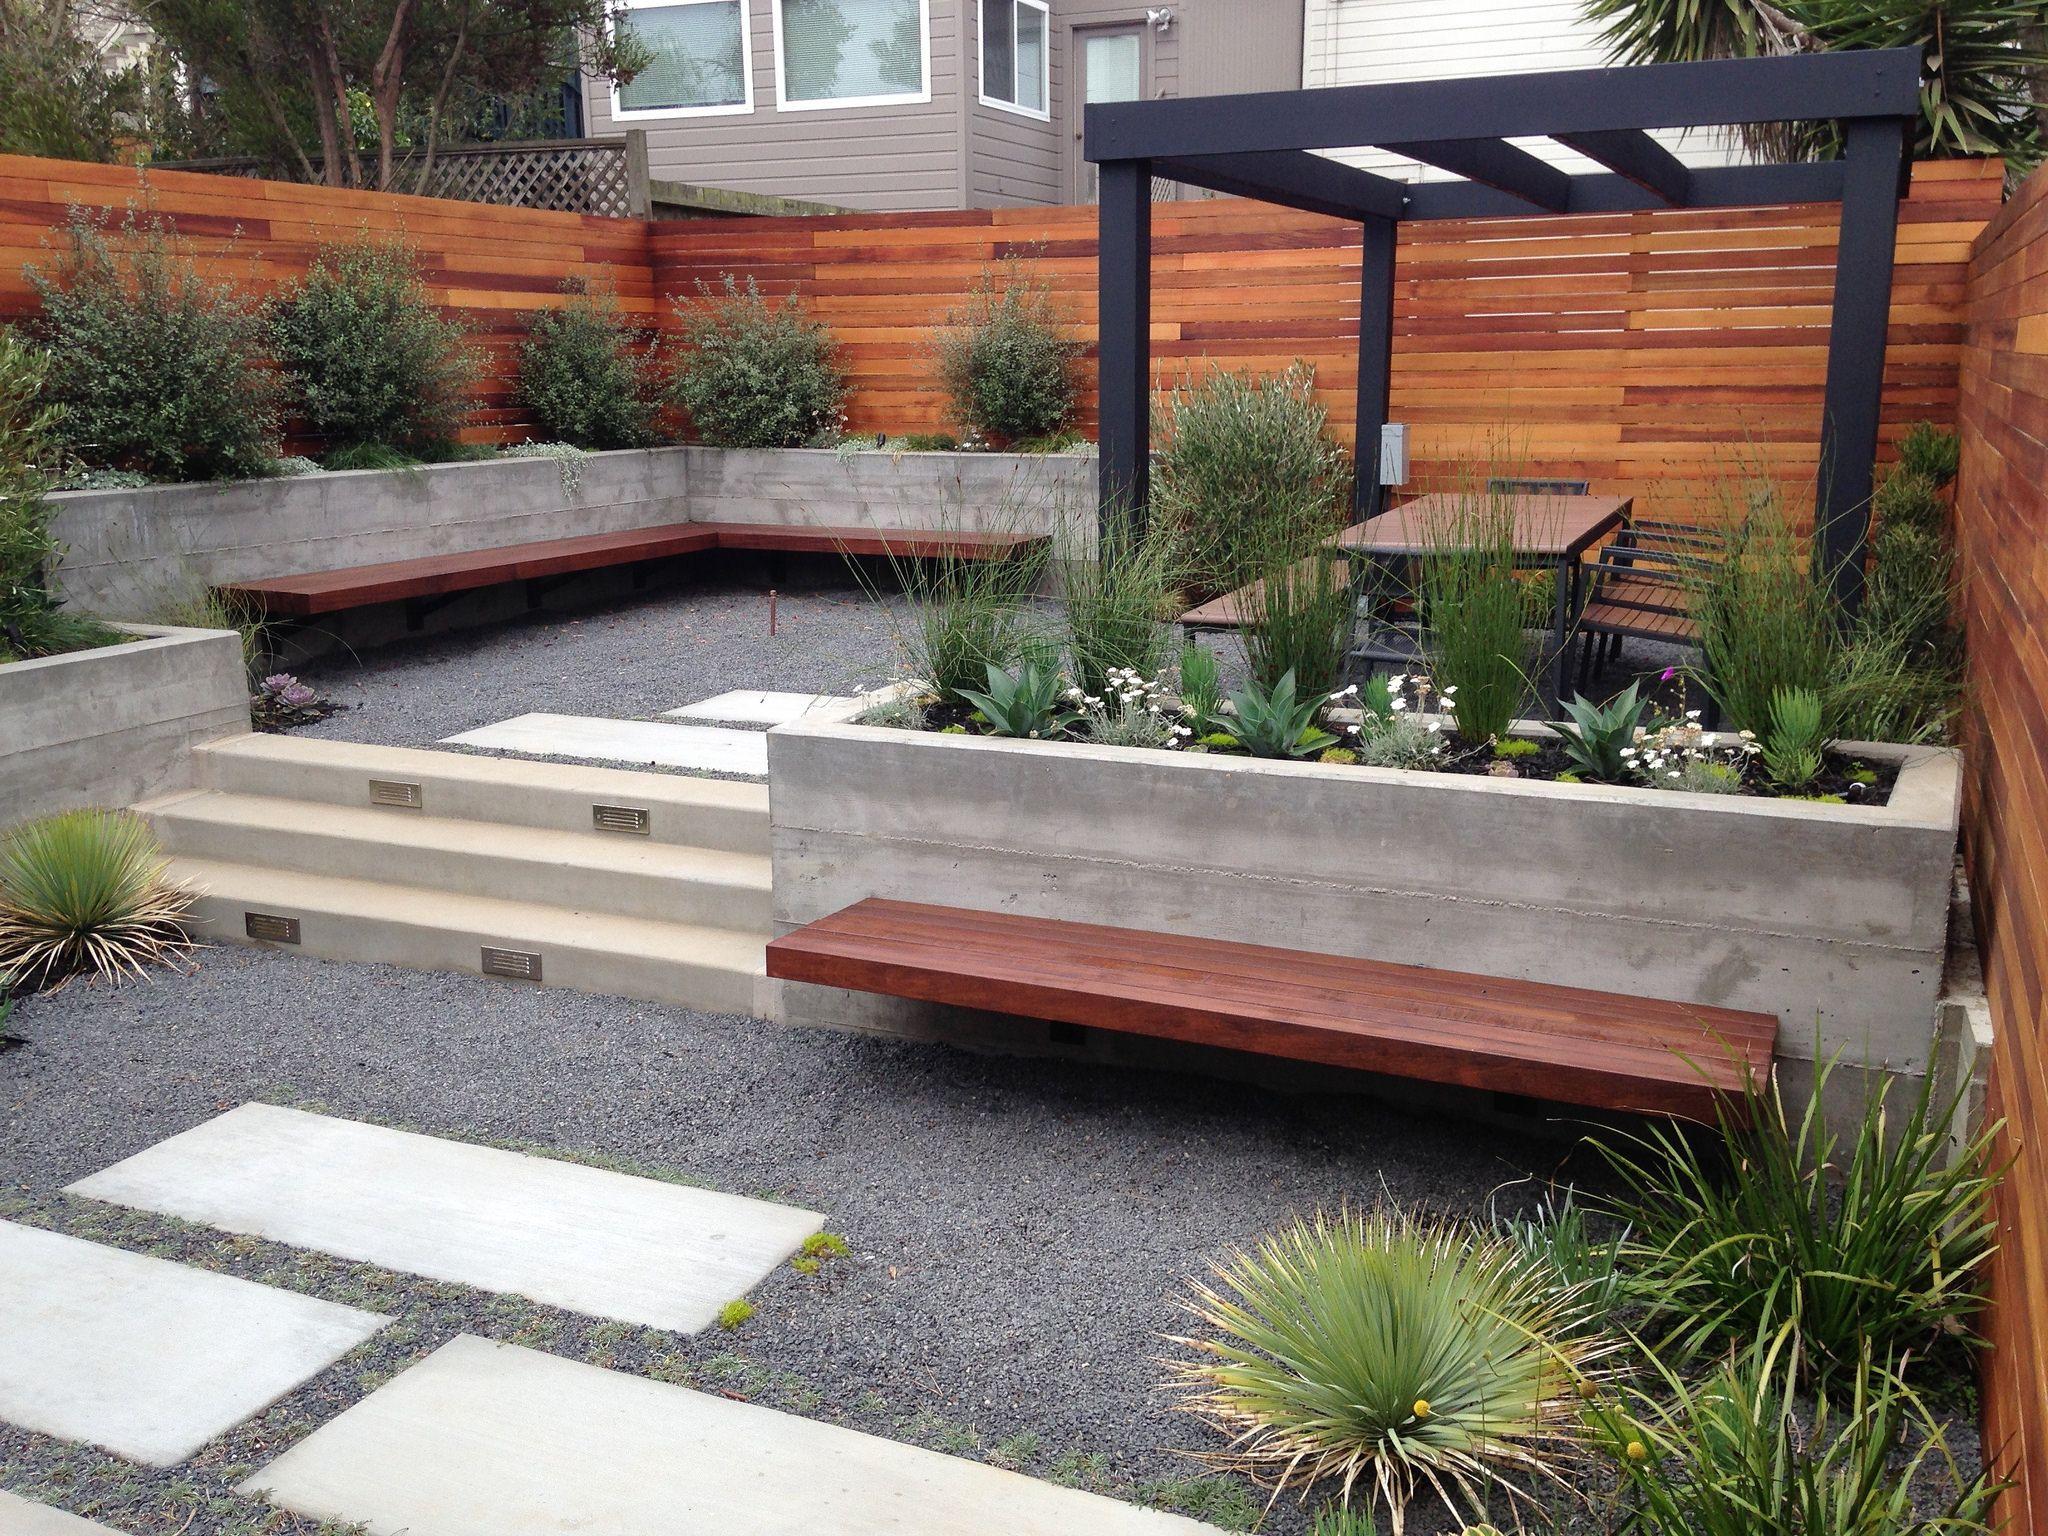 Growsgreen Landscape Design Beth Mullins Concrete Walls Ipe Bench Cedar Horizontal Board Fence Modern Tr Modern Landscaping Backyard Fence Installation Cost